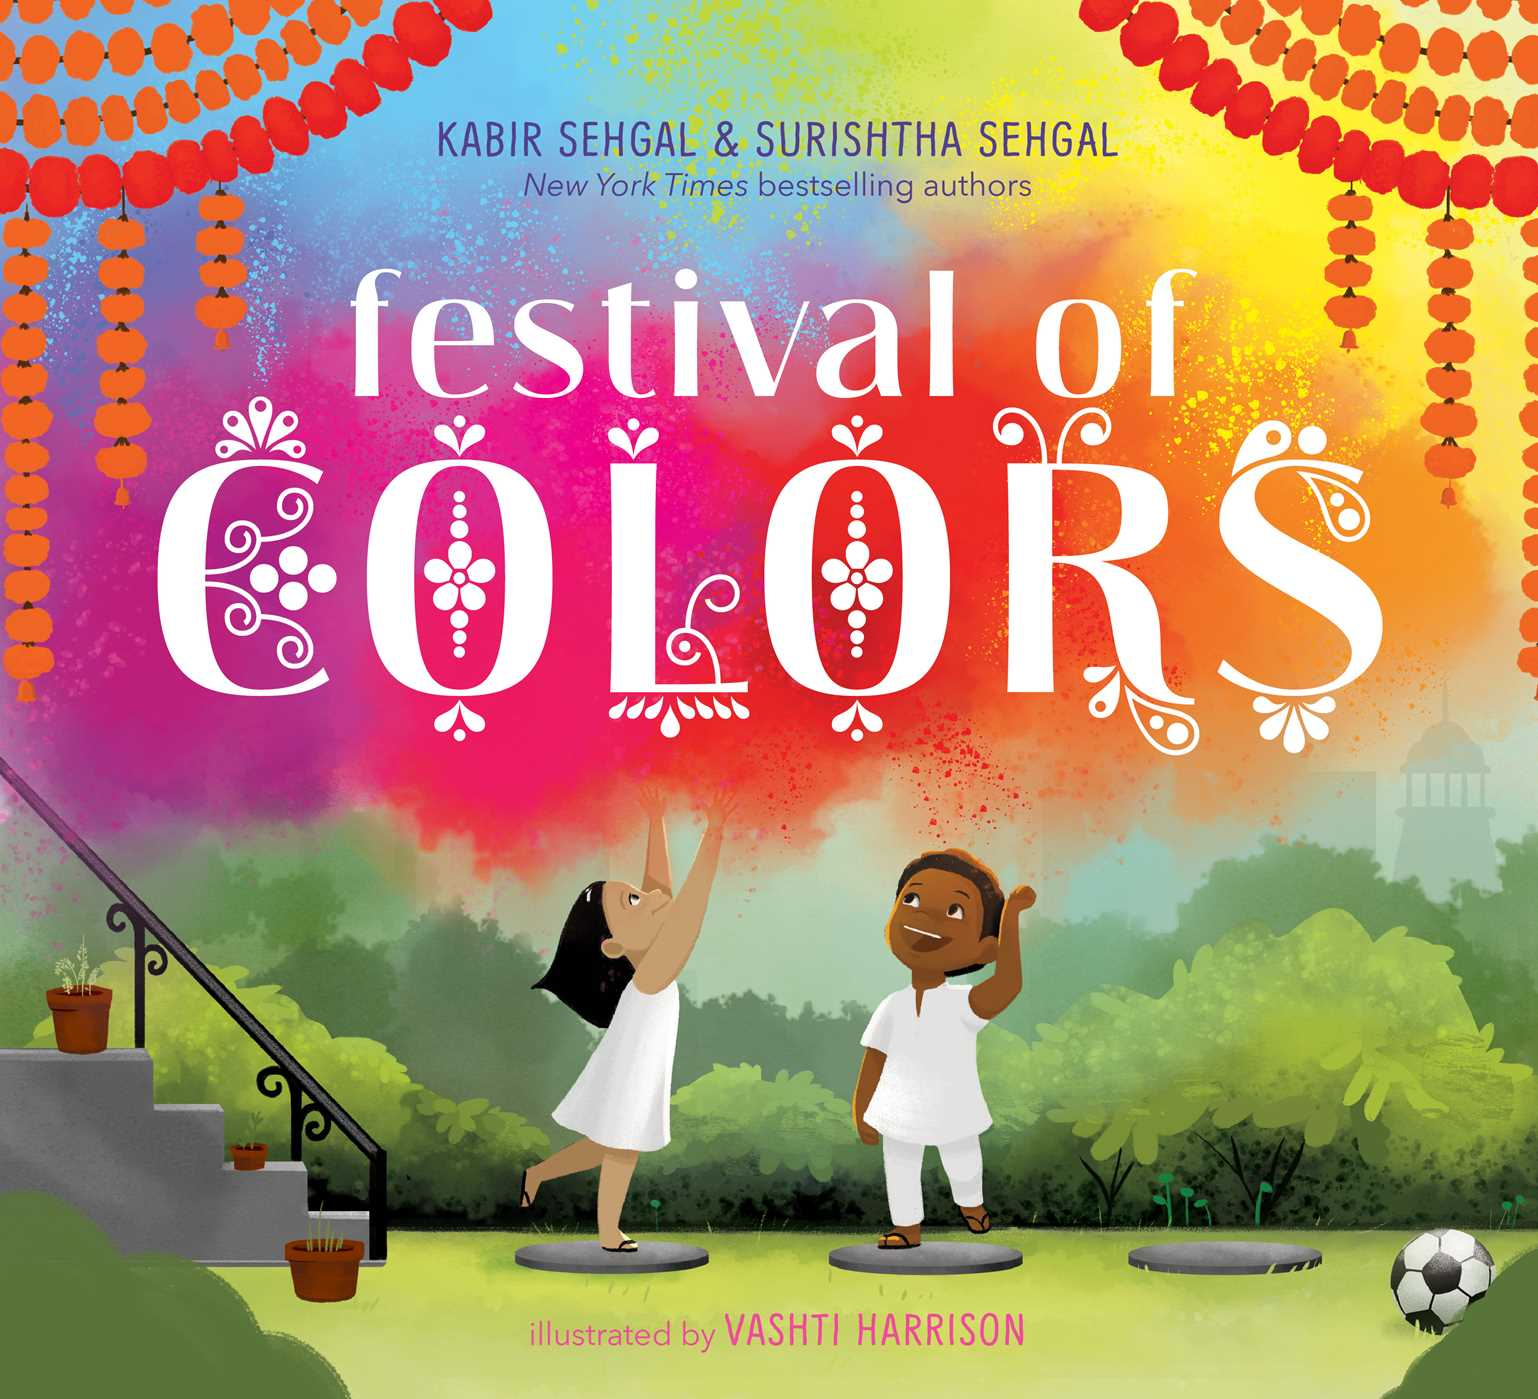 Festival of Colors | Book by Surishtha Sehgal, Kabir Sehgal, Vashti ...